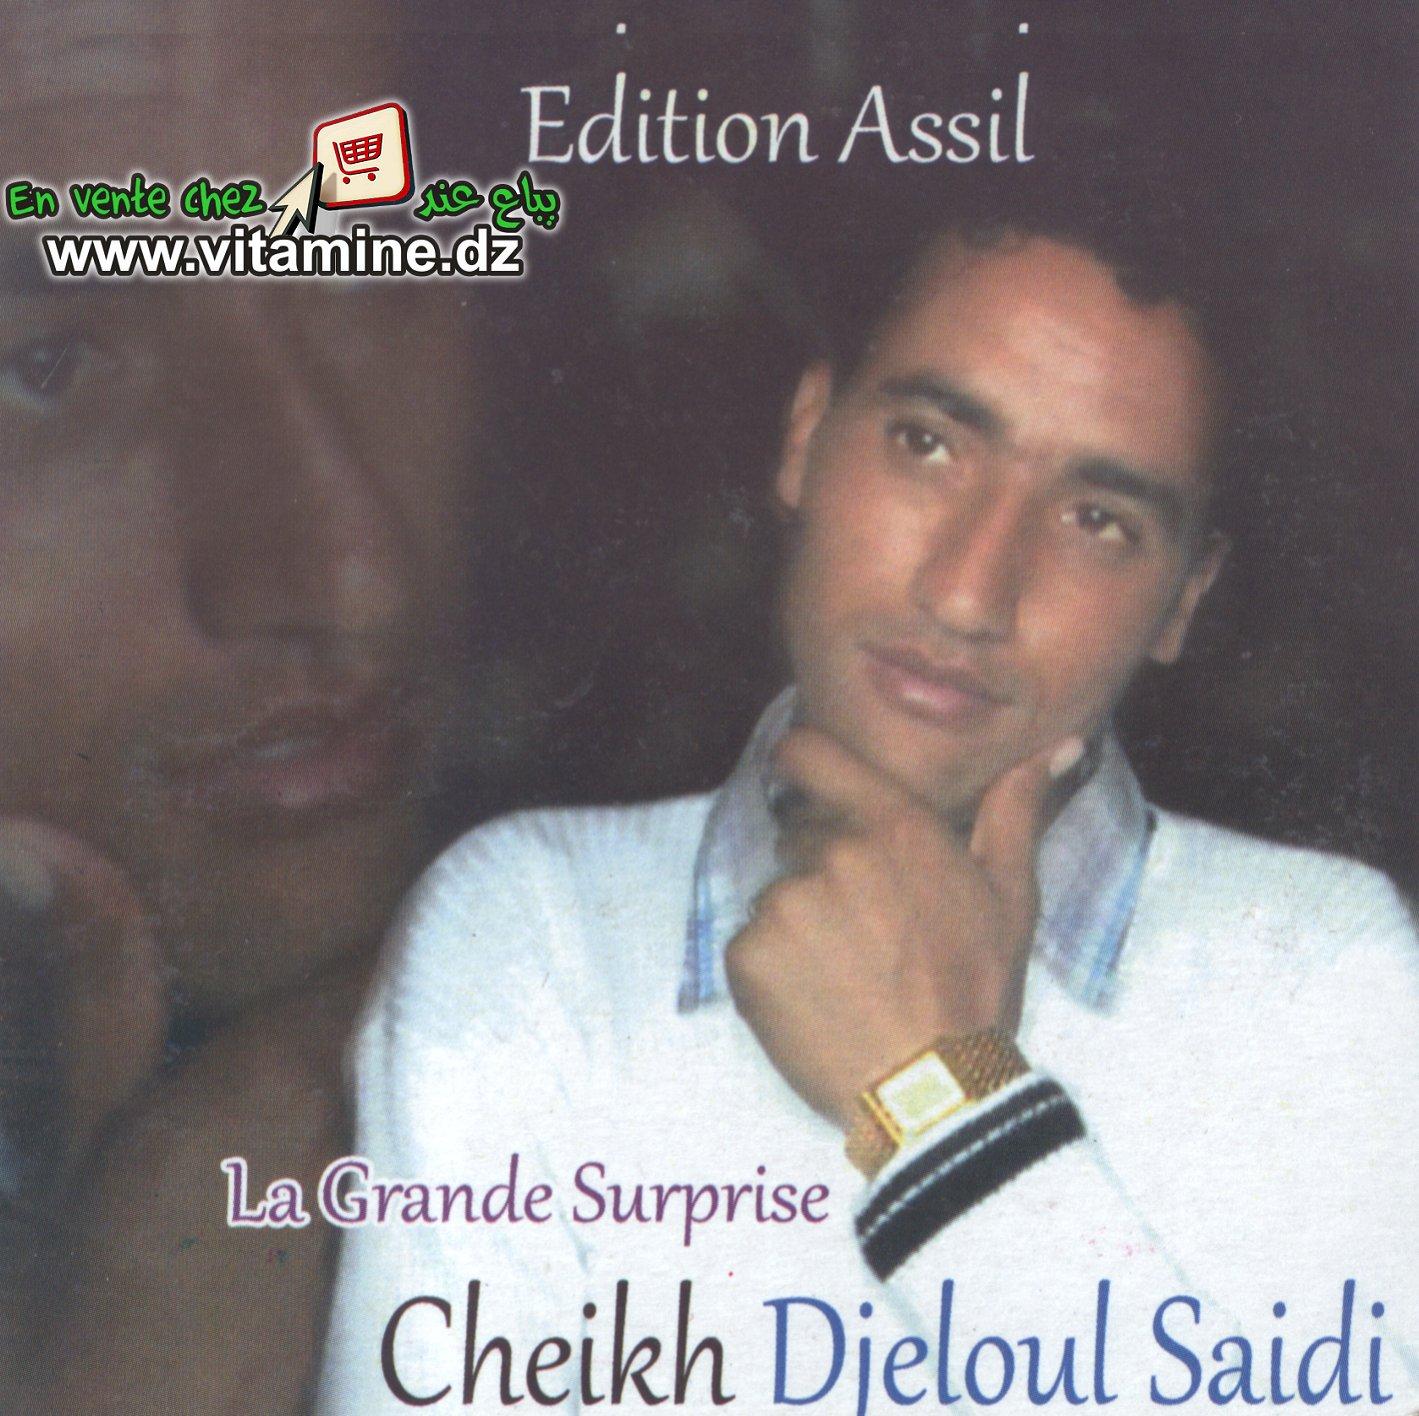 Cheikh djeloul - la grande surprise